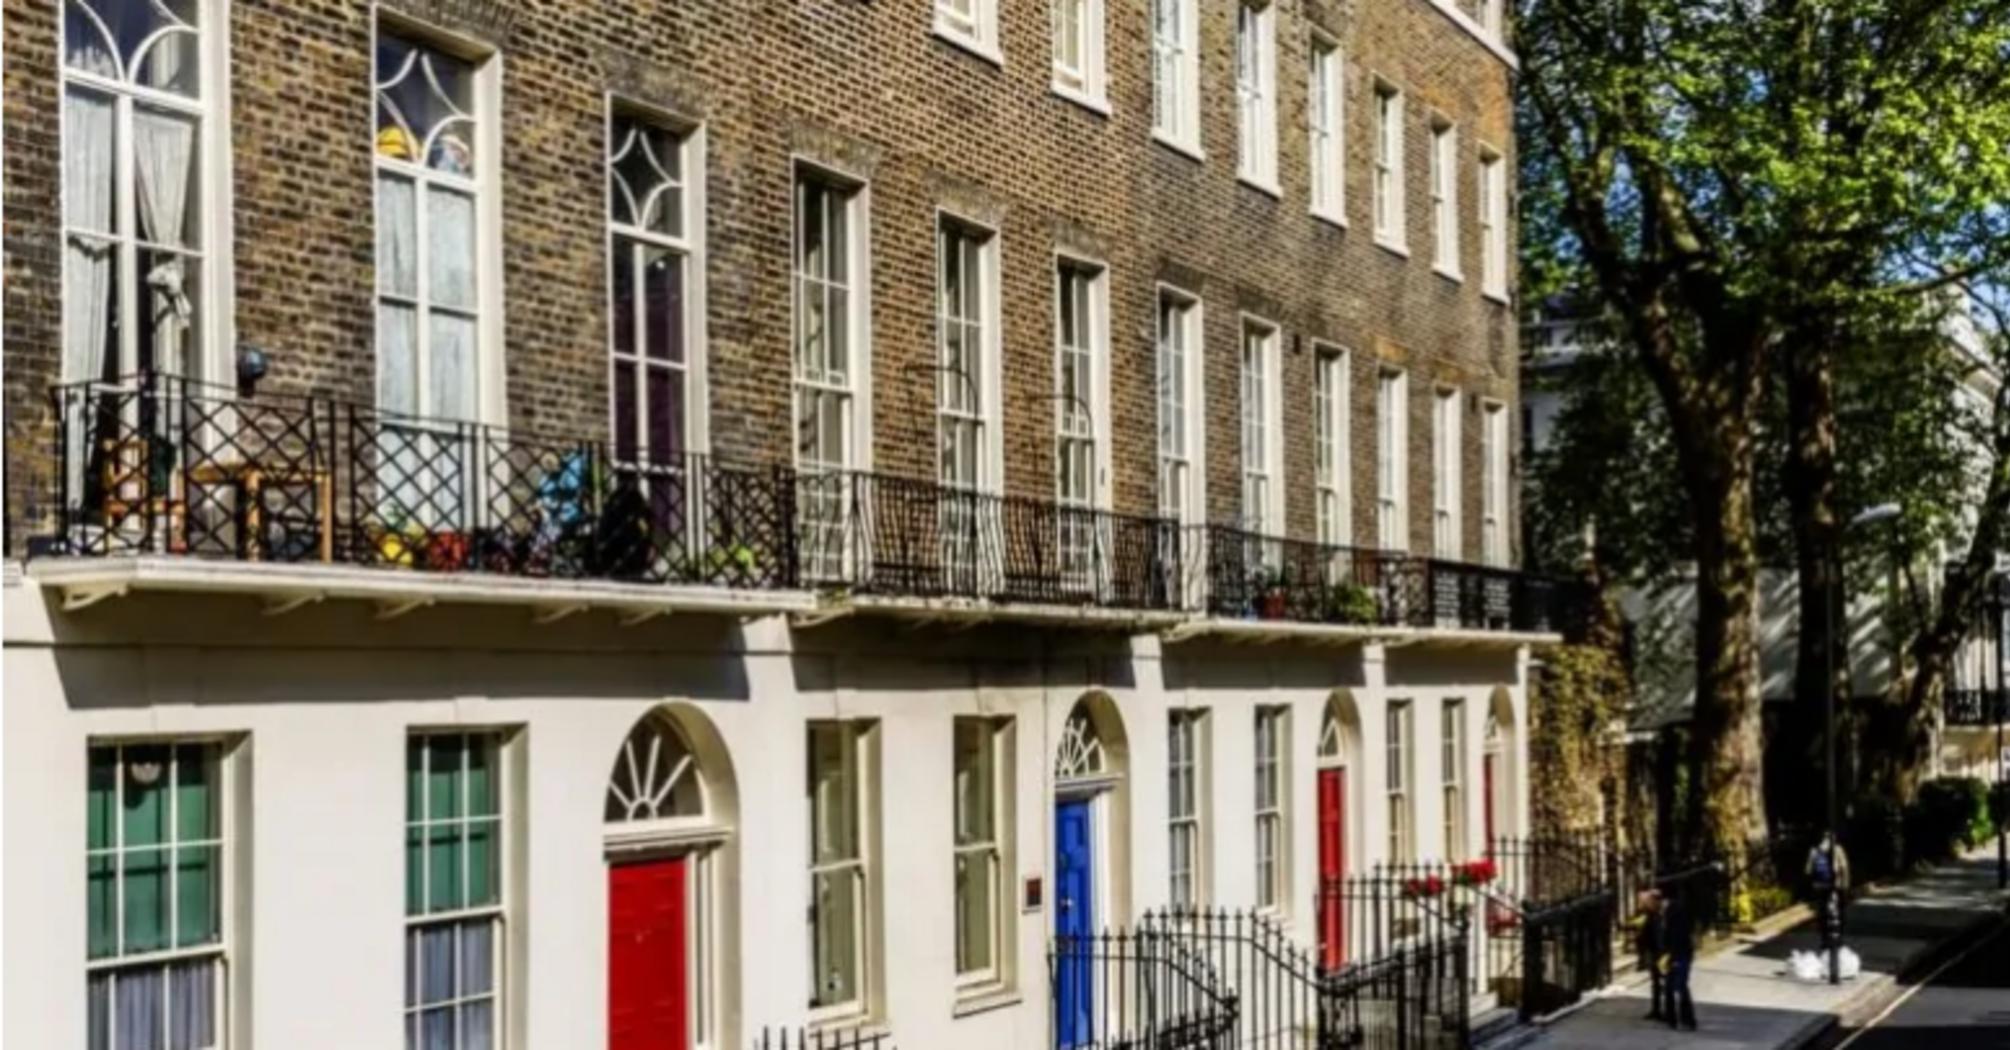 Визначено райони Лондона, де житло продається найшвидше